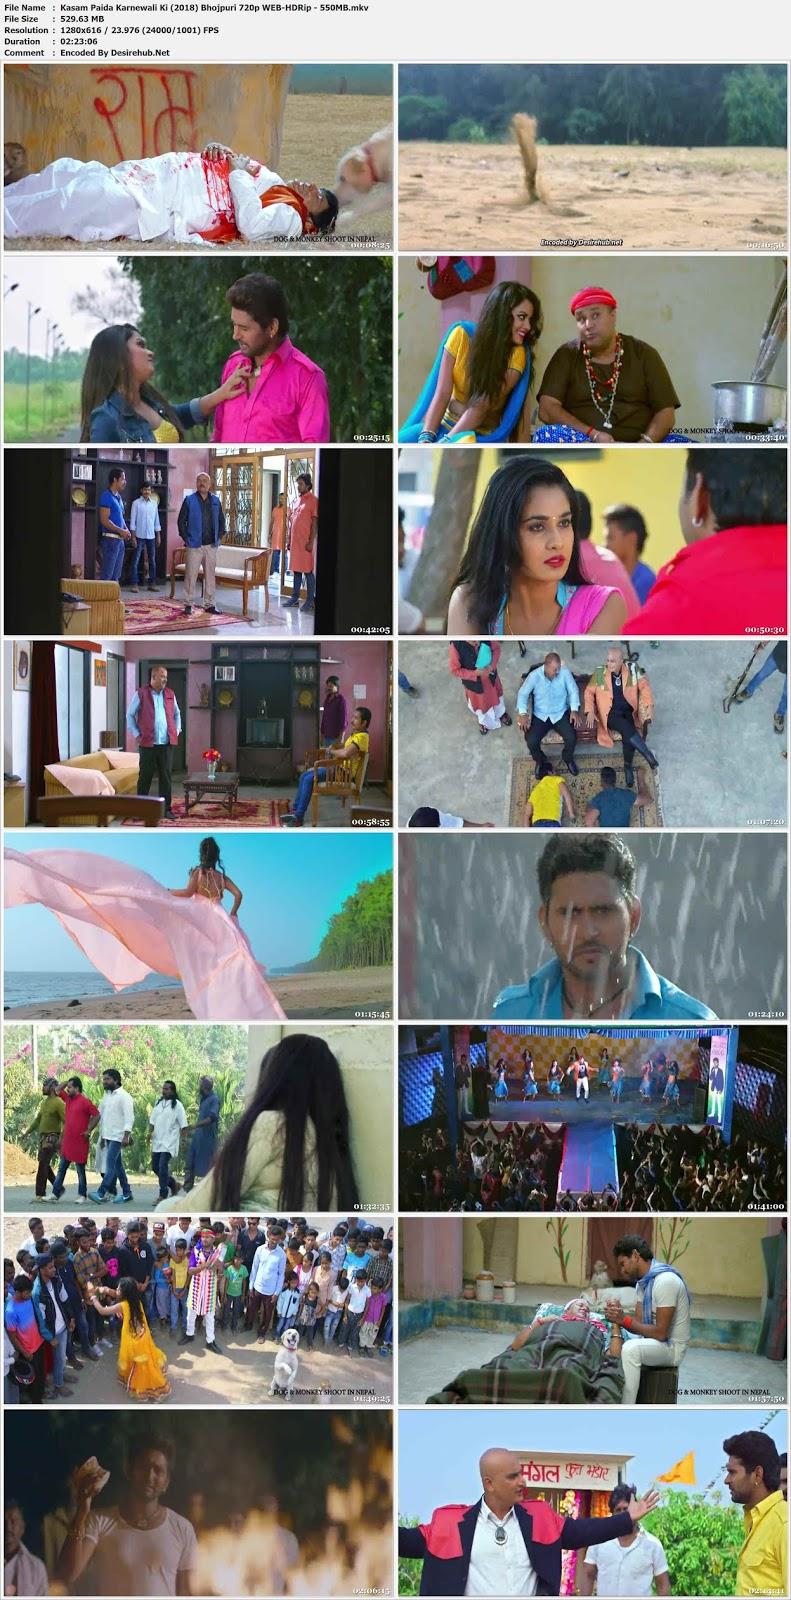 Kasam Paida Karnewali Ki (2017) Bhojpuri 720p WEB-DL – 550MB Desirehub